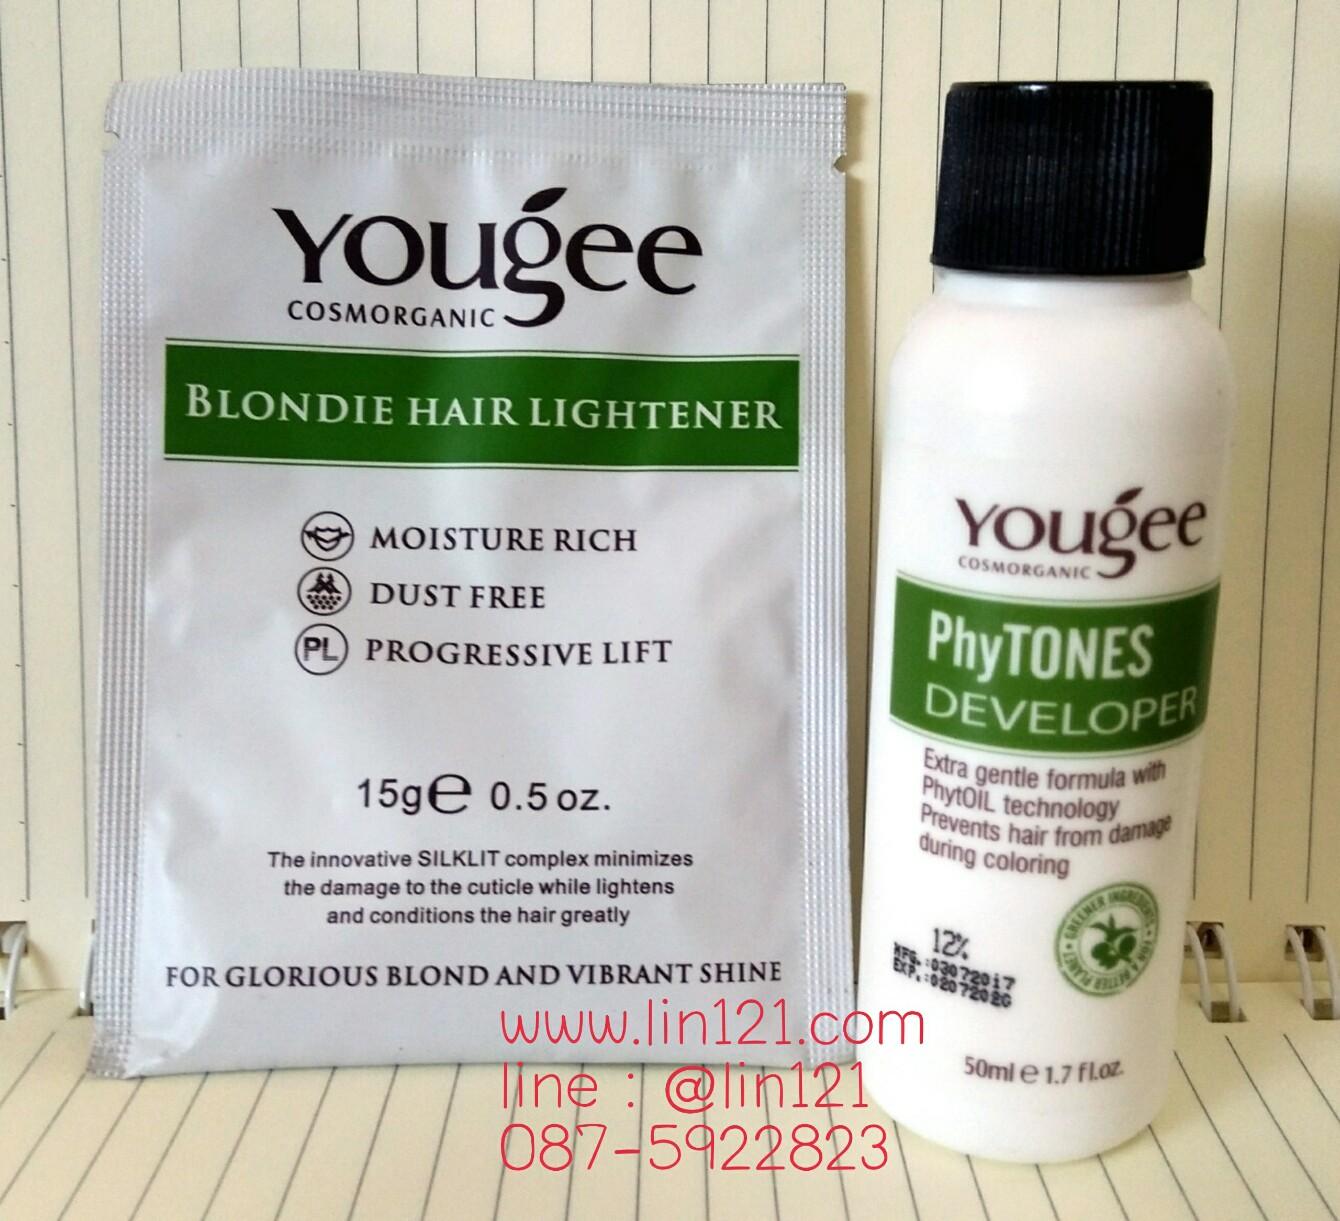 Yougee Blondie Hair Lightener ยูจี ชุดฟอกสีผม 15g+50ml